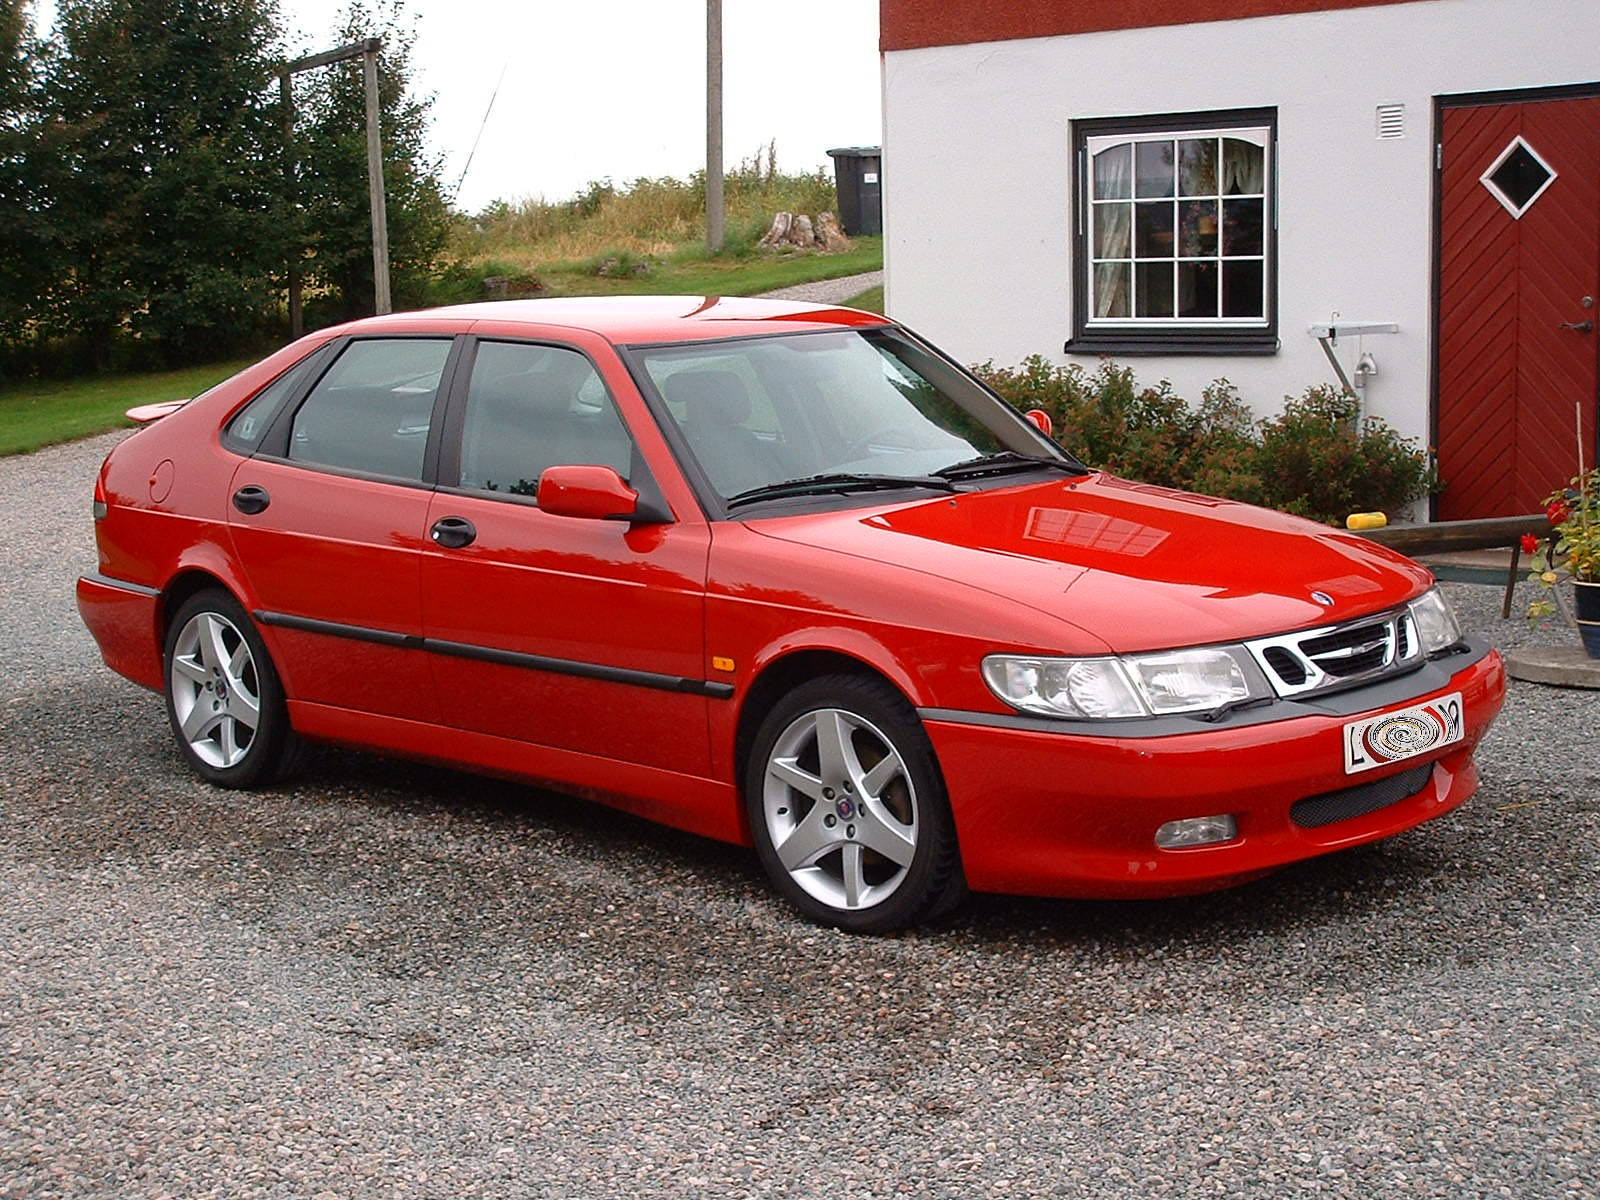 Saab 9 3 Turbo Upgrade >> Life with Saab - Essential Saab news: My blog about life with the new Saab 9-5